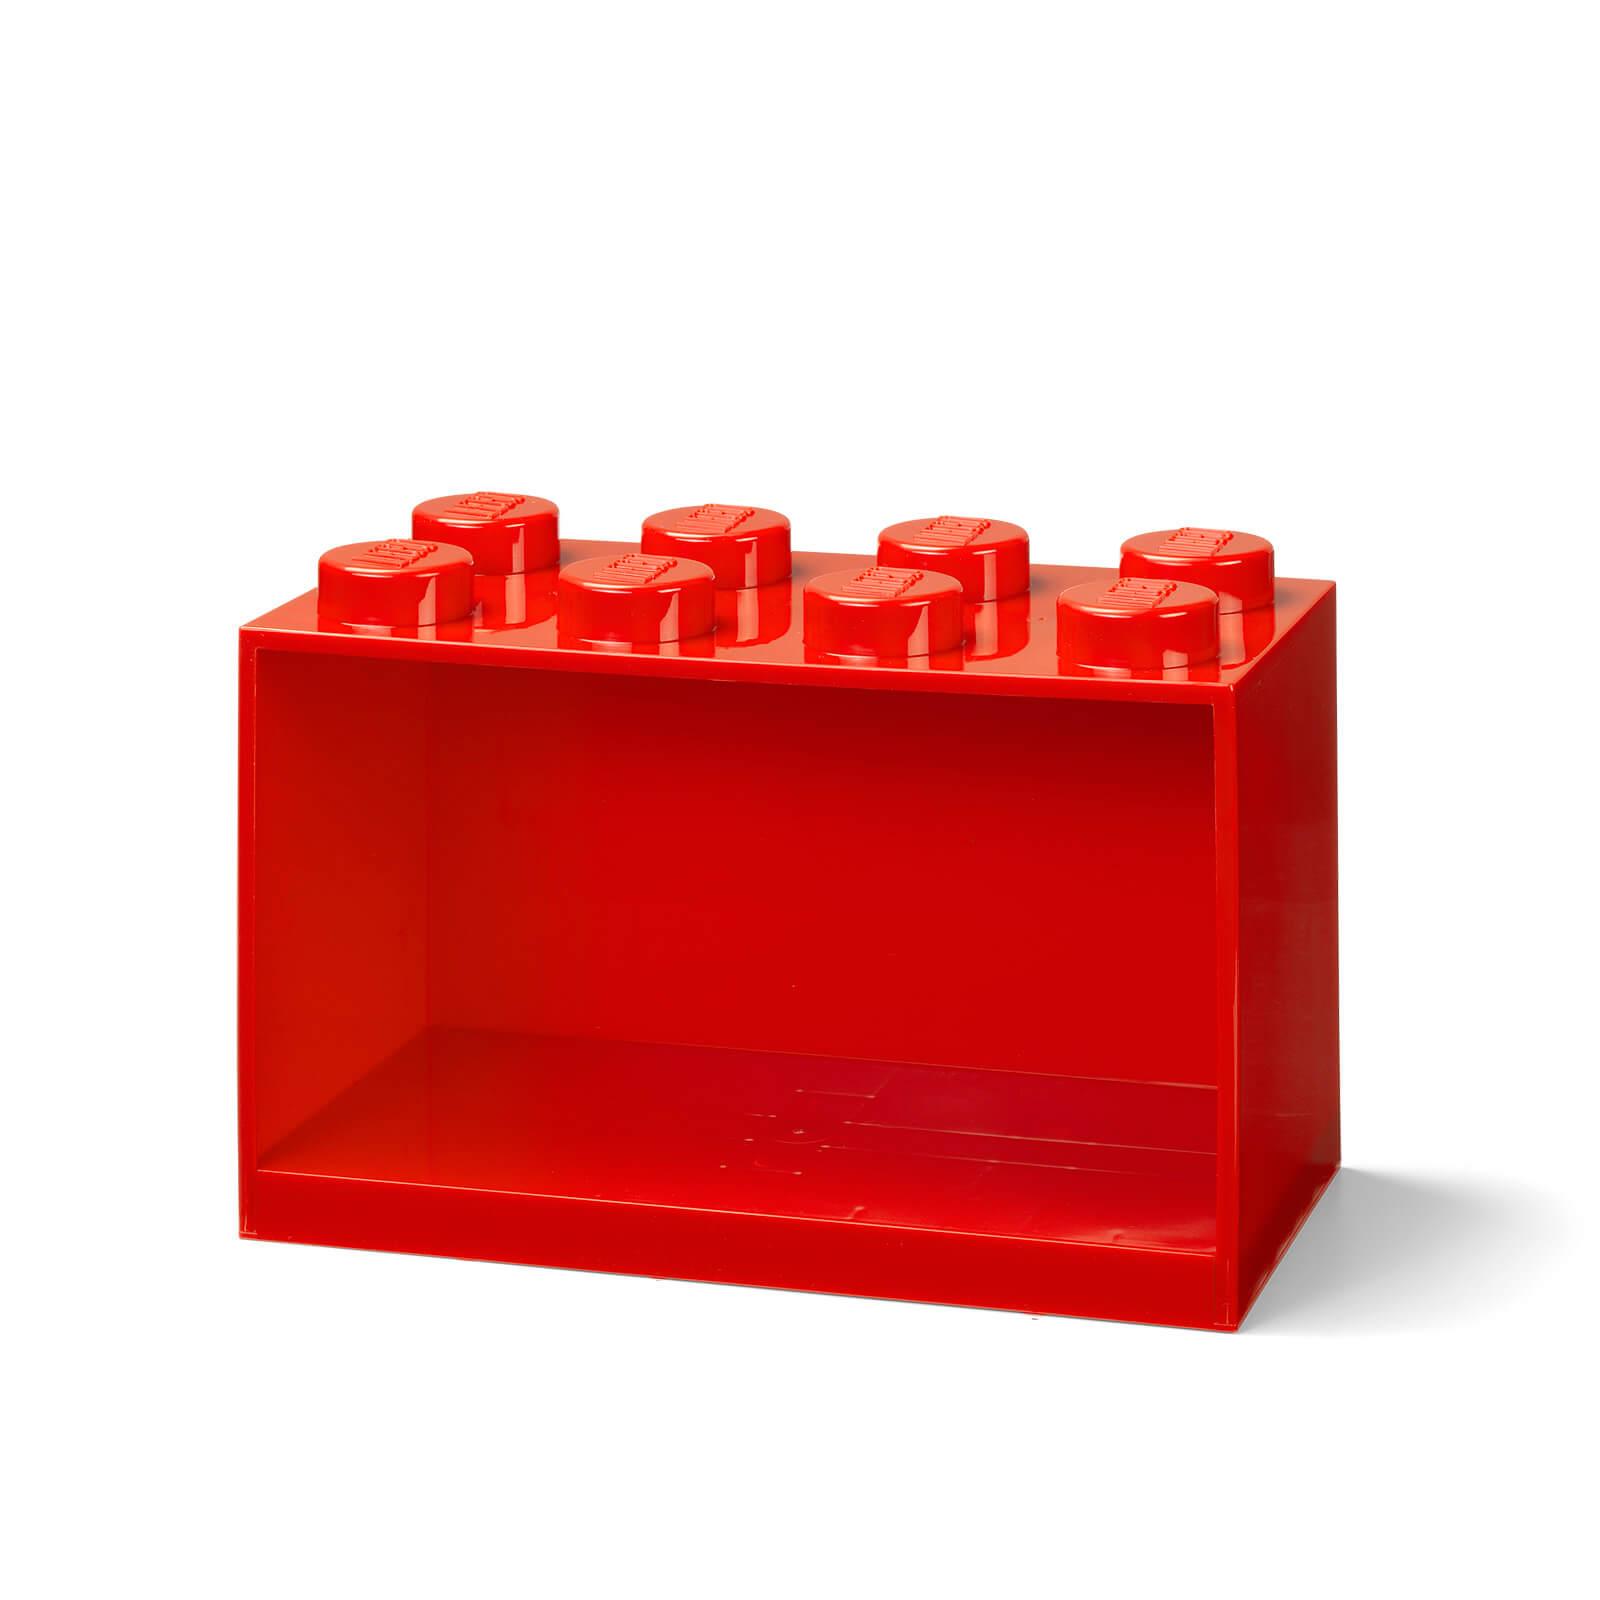 Image of LEGO Storage Brick Shelf 8 - Red